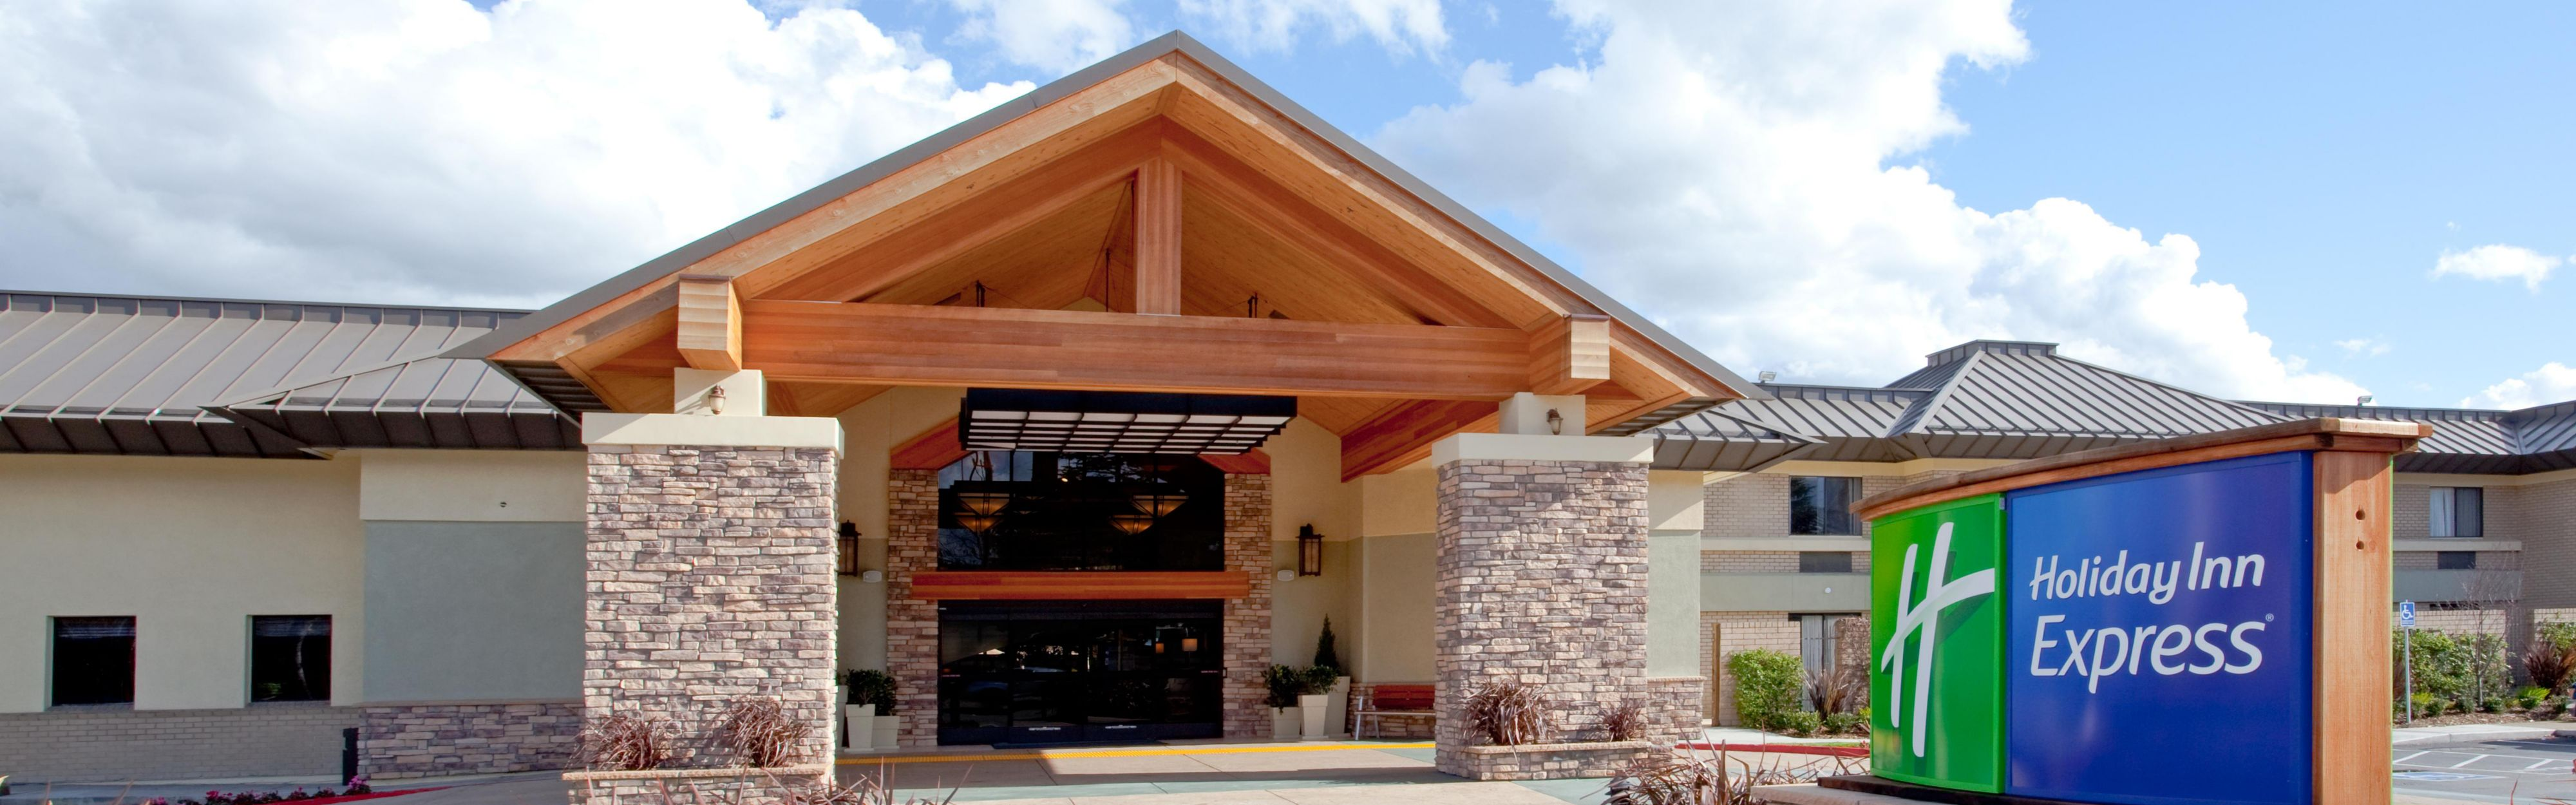 Holiday Inn Express Walnut Creek image 0